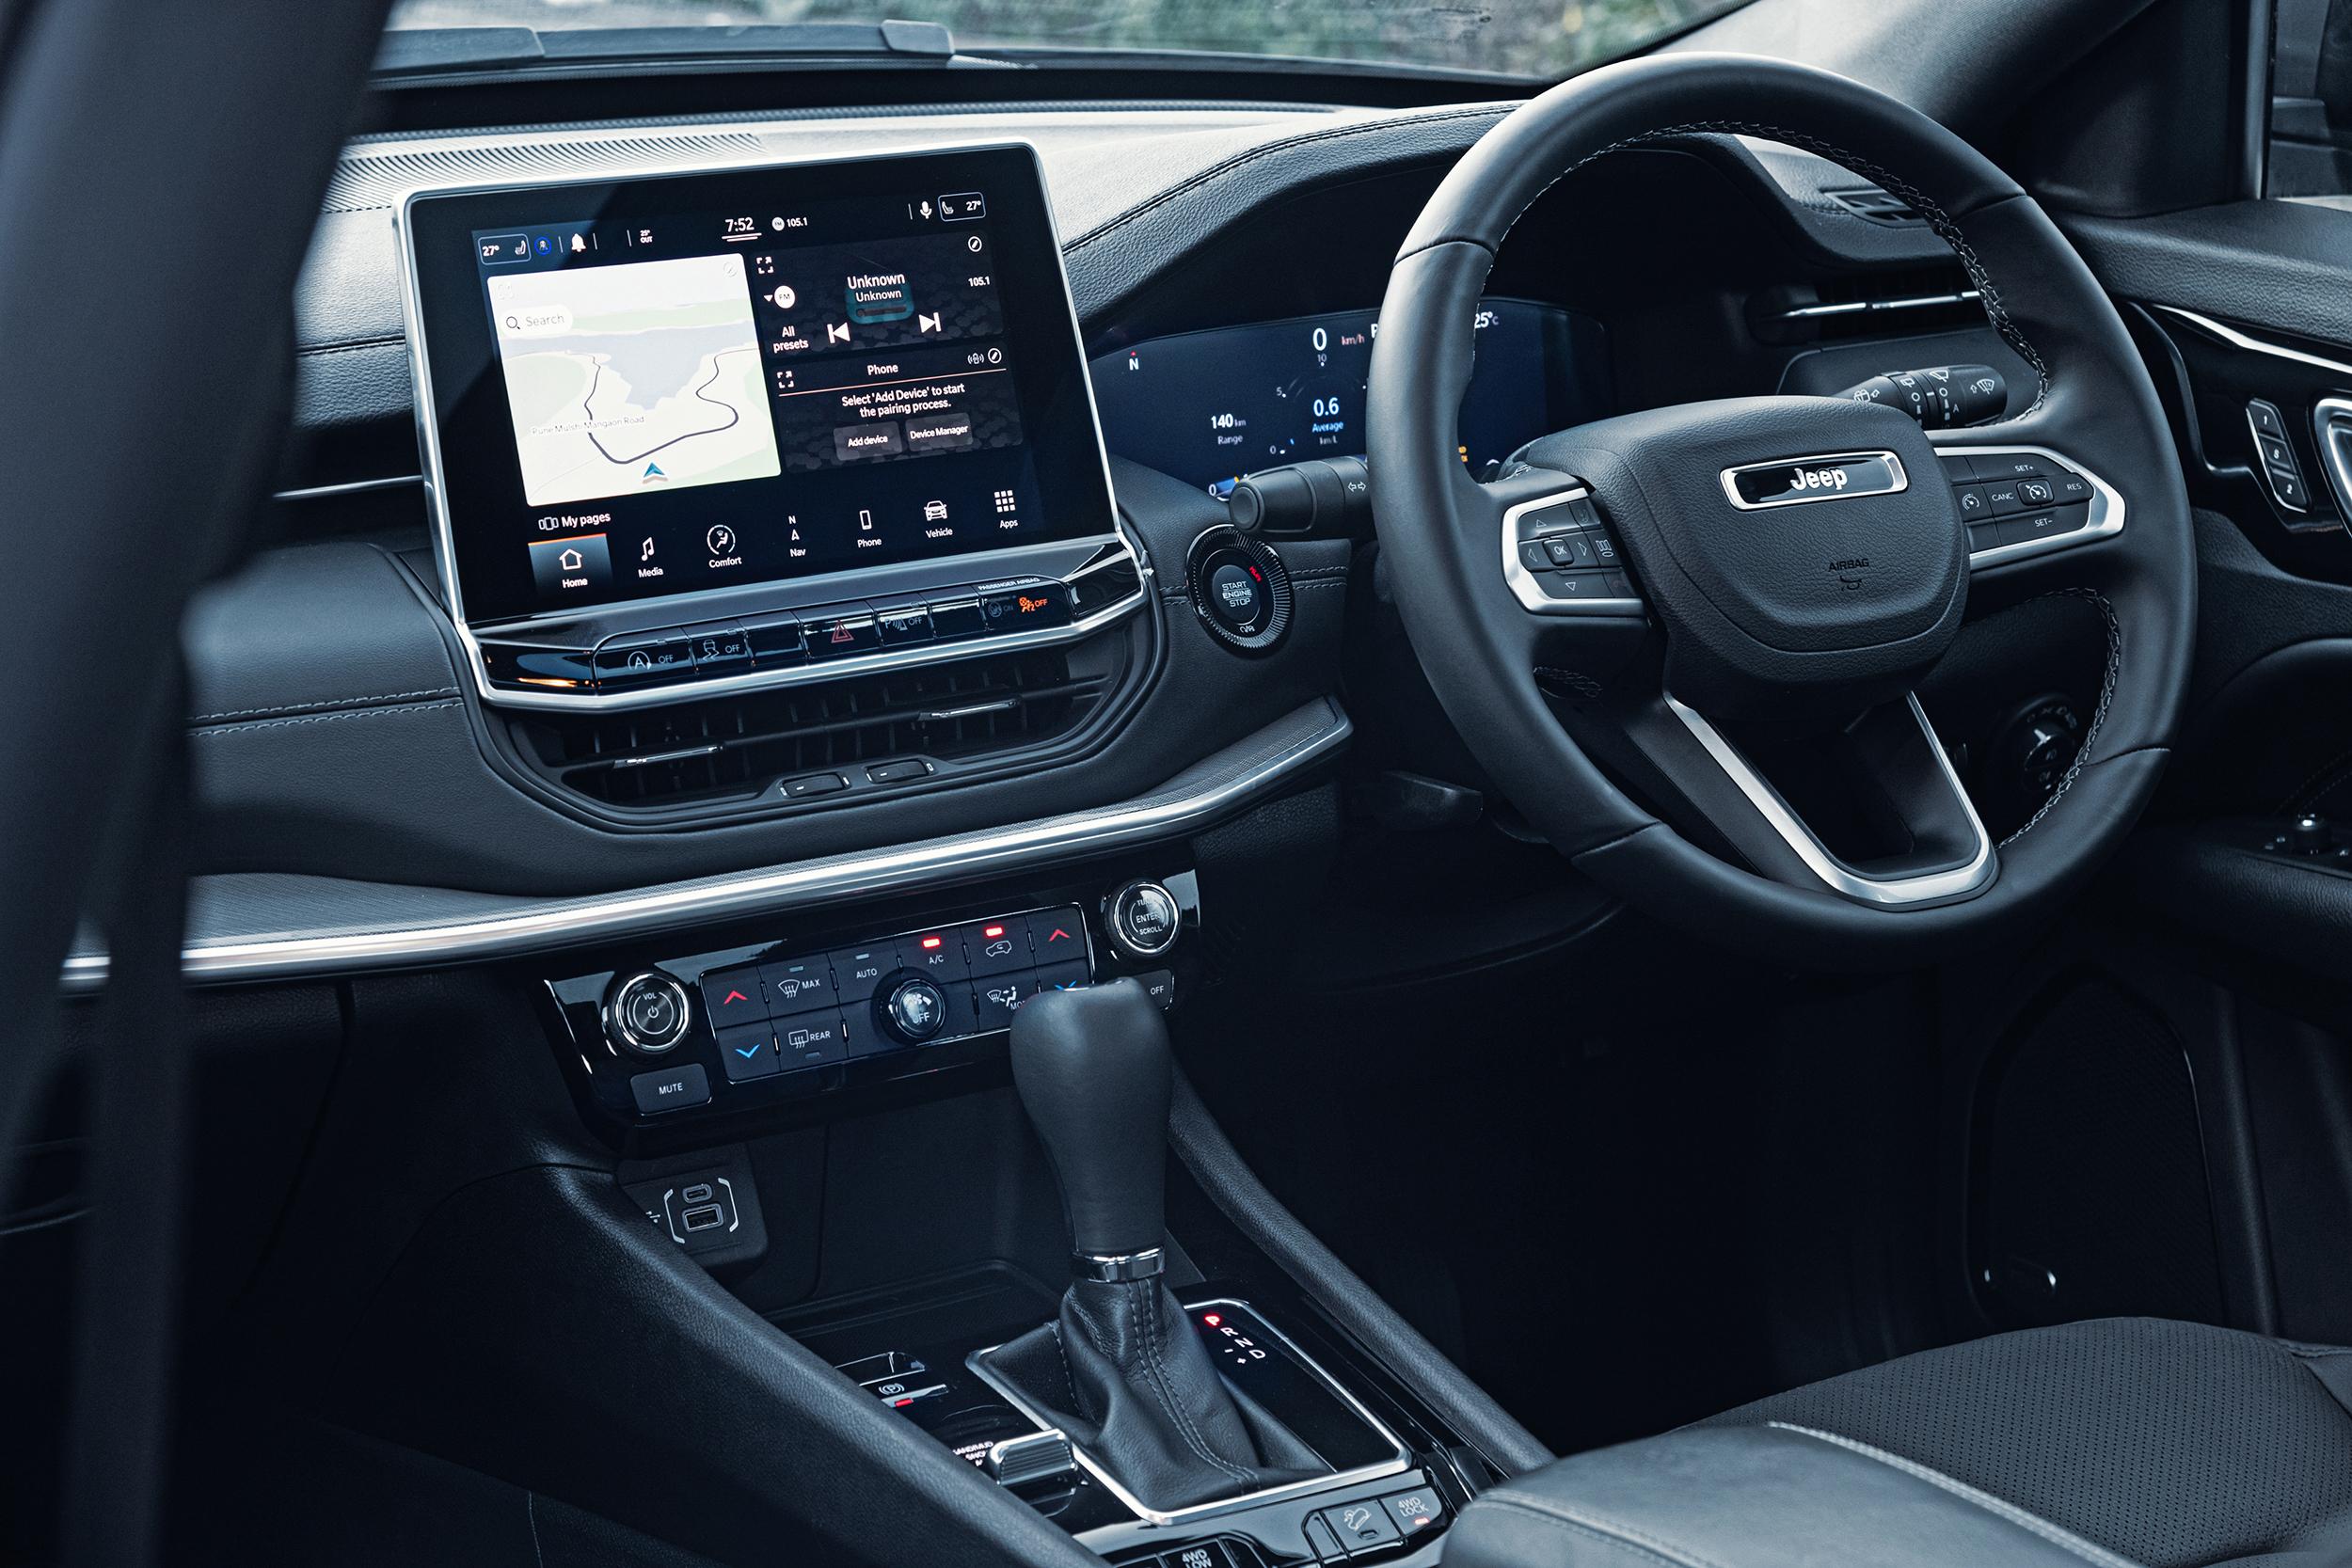 jeep compass 2022 interior com central multimidia e painel digital